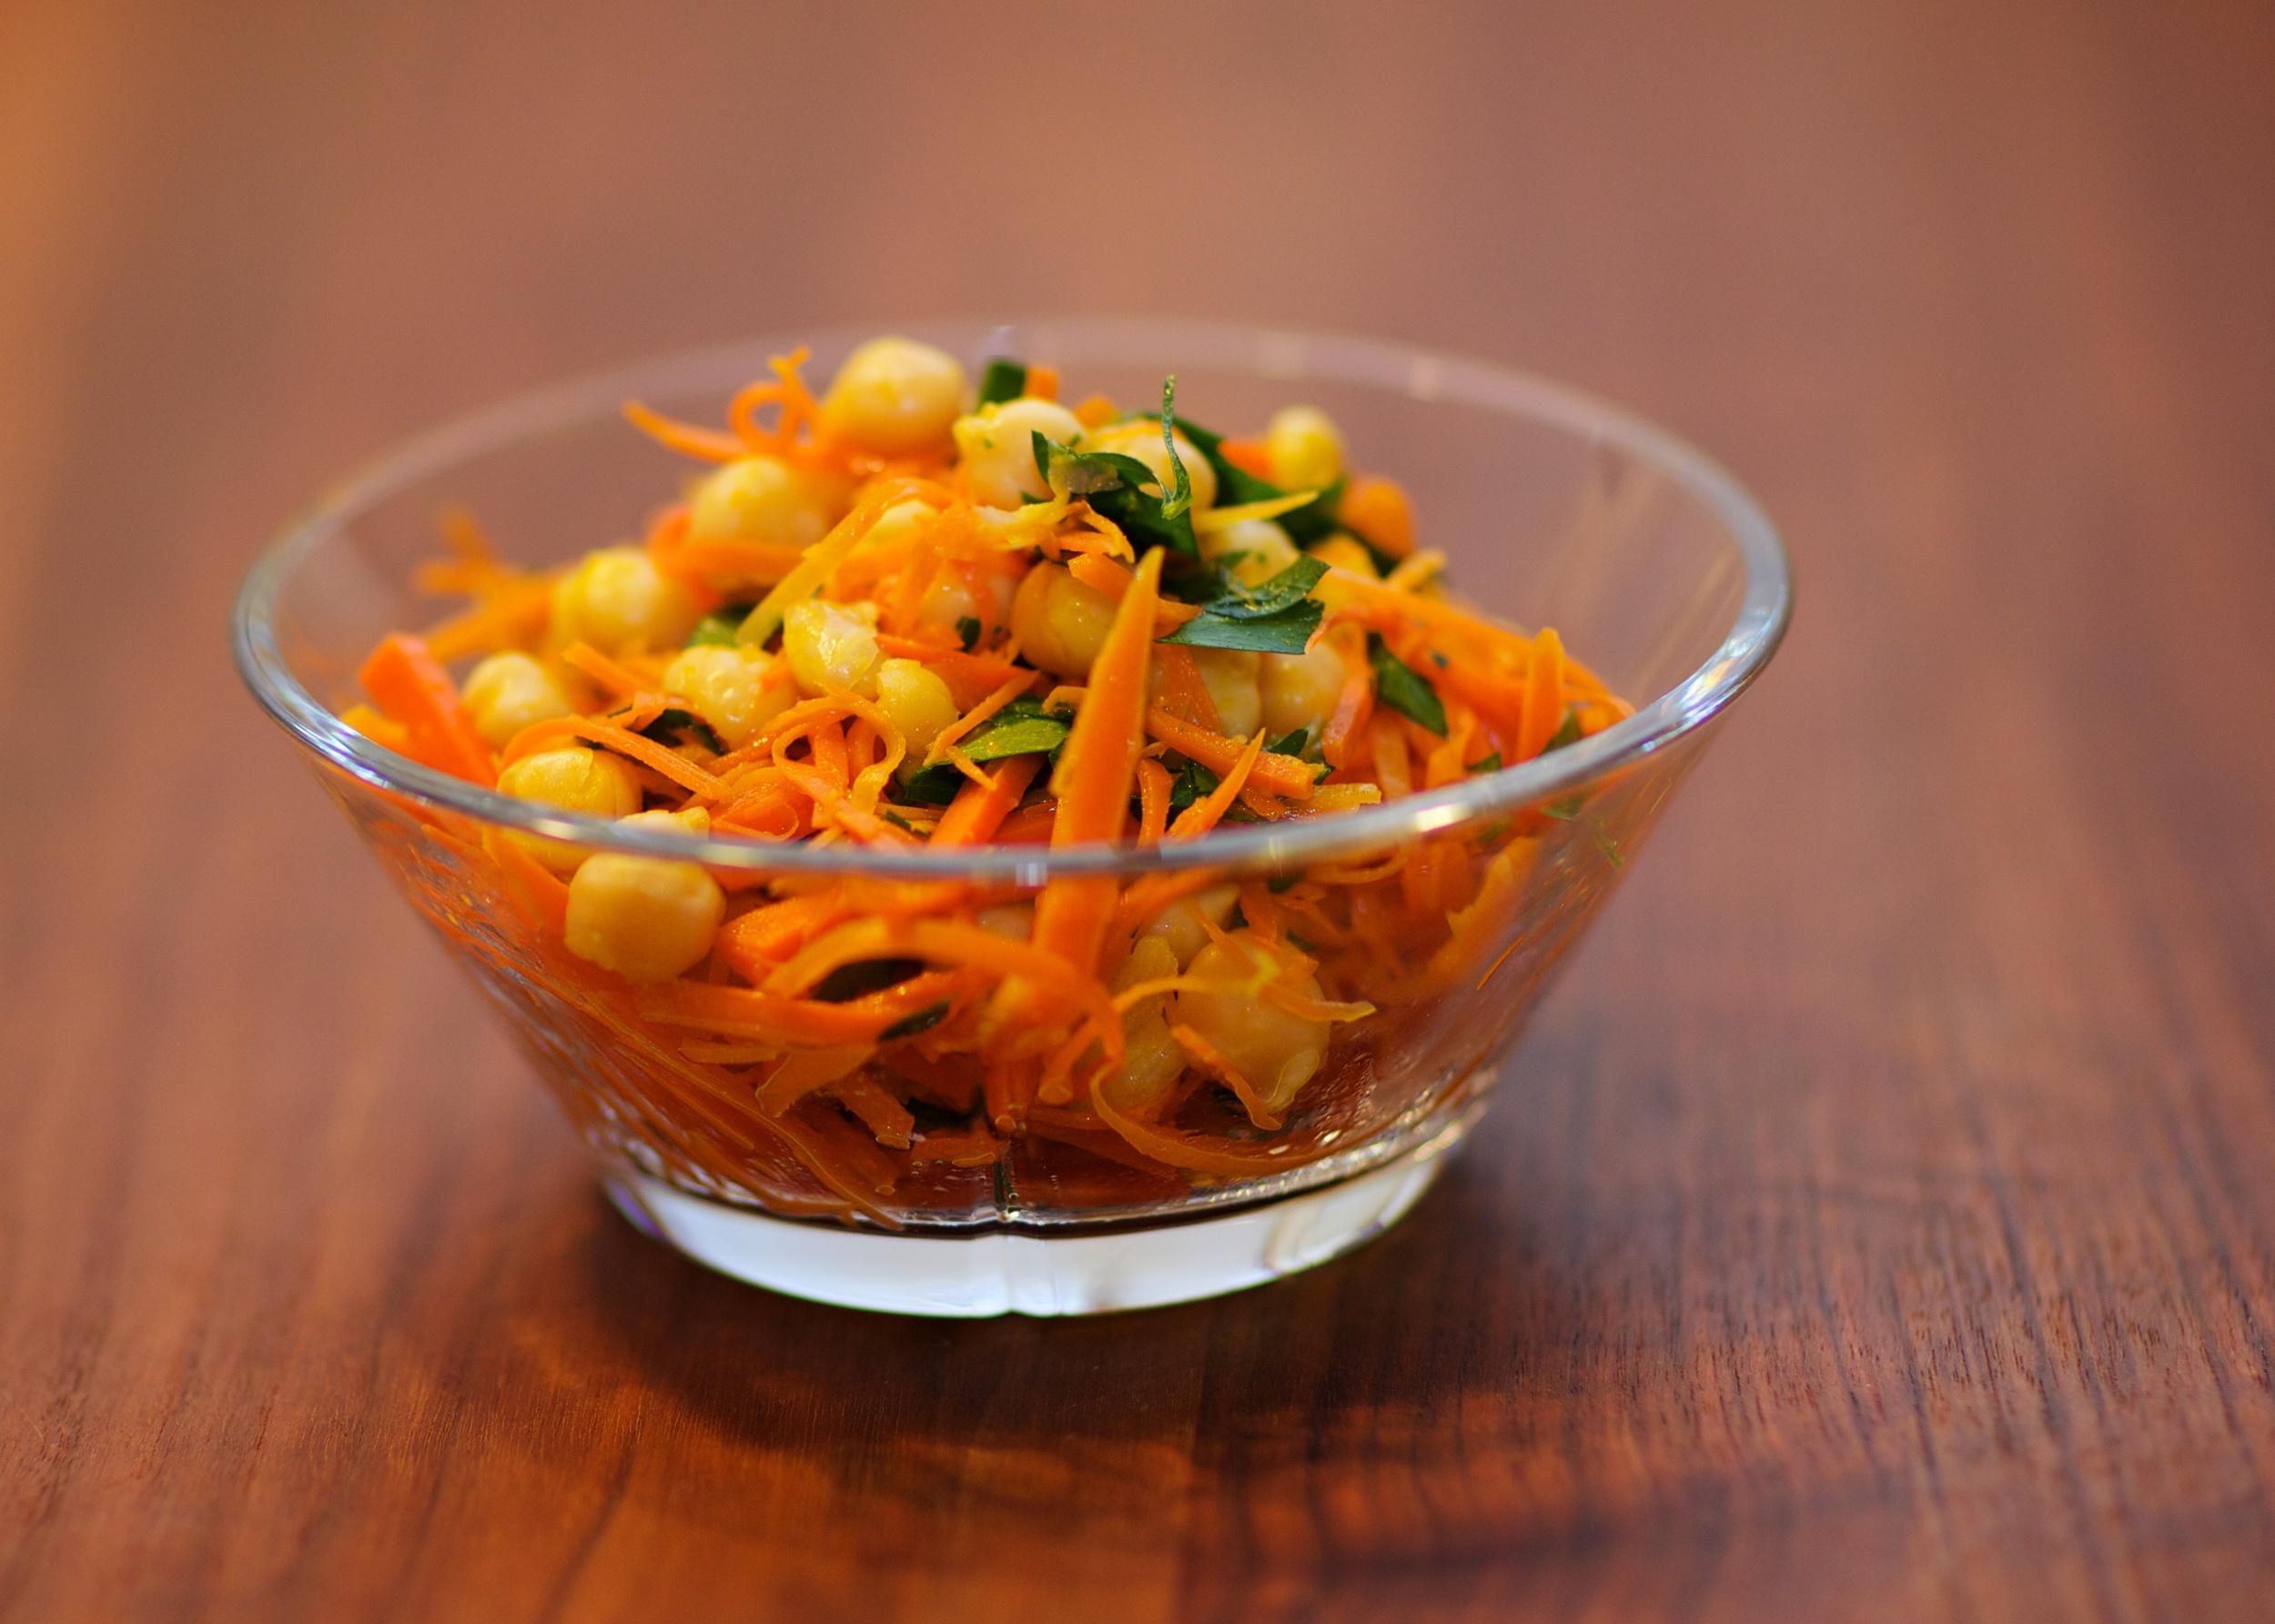 Chickpea and carrot salad a la Thomas Keller.